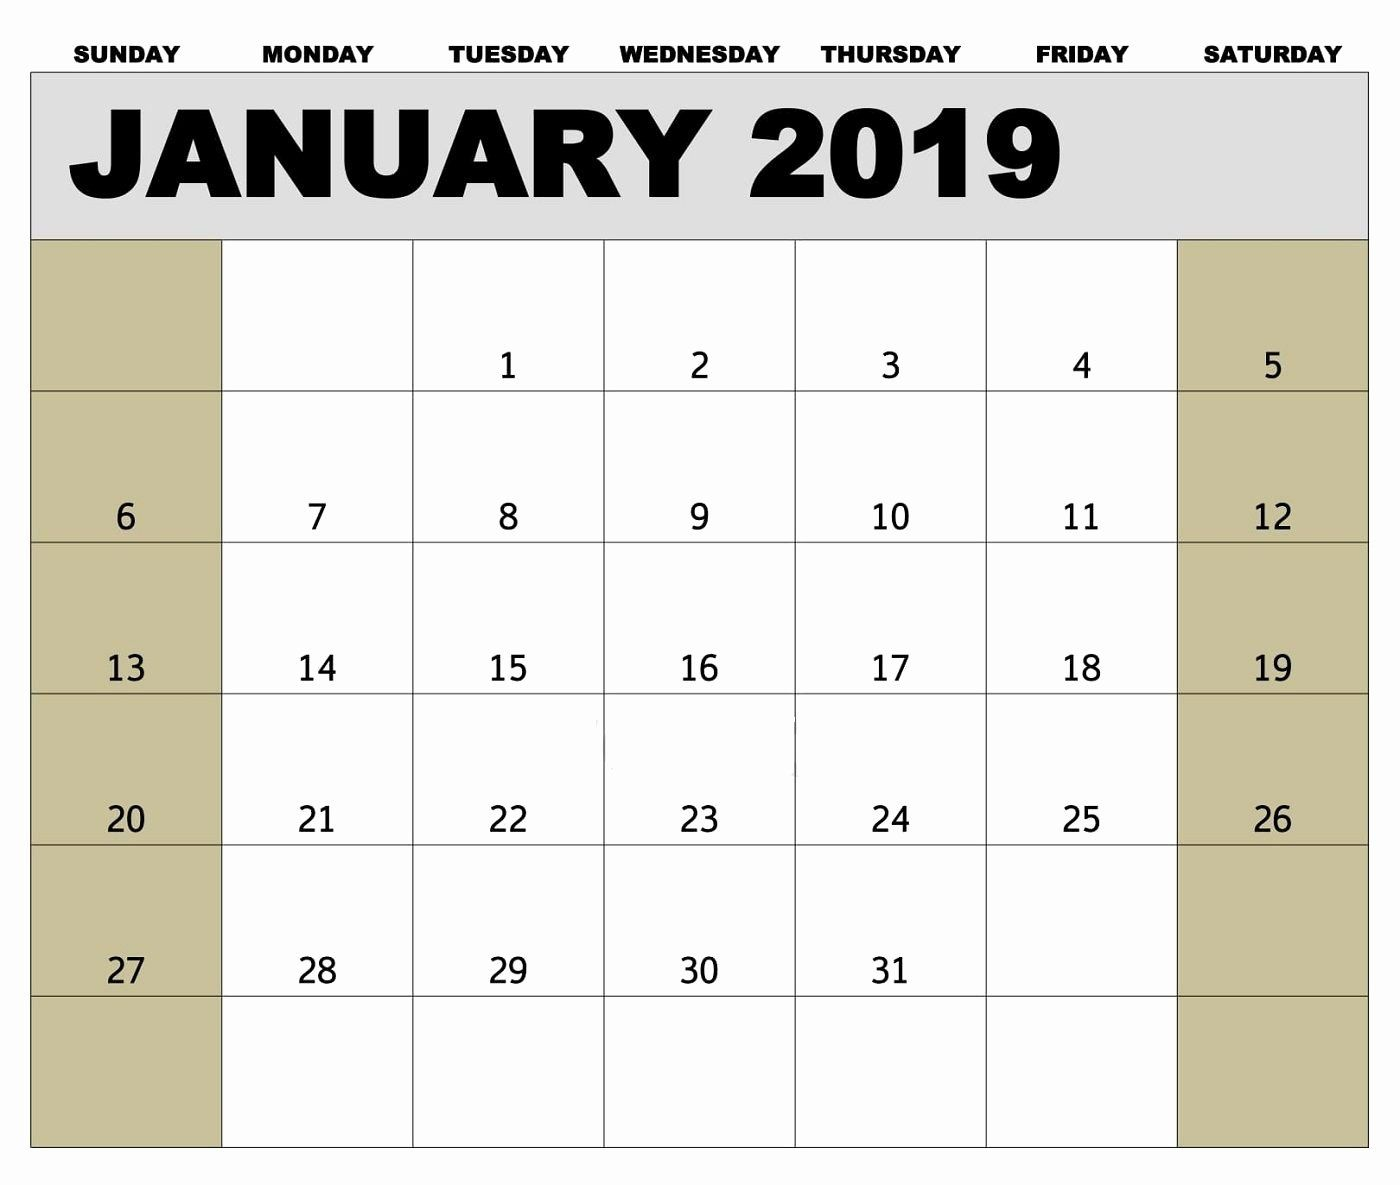 2019 Biweekly Payroll Calendar Template Excel Fresh 2019 Payroll Calendar Printable In 2020 Calendar Template Payroll Calendar Excel Calendar Template